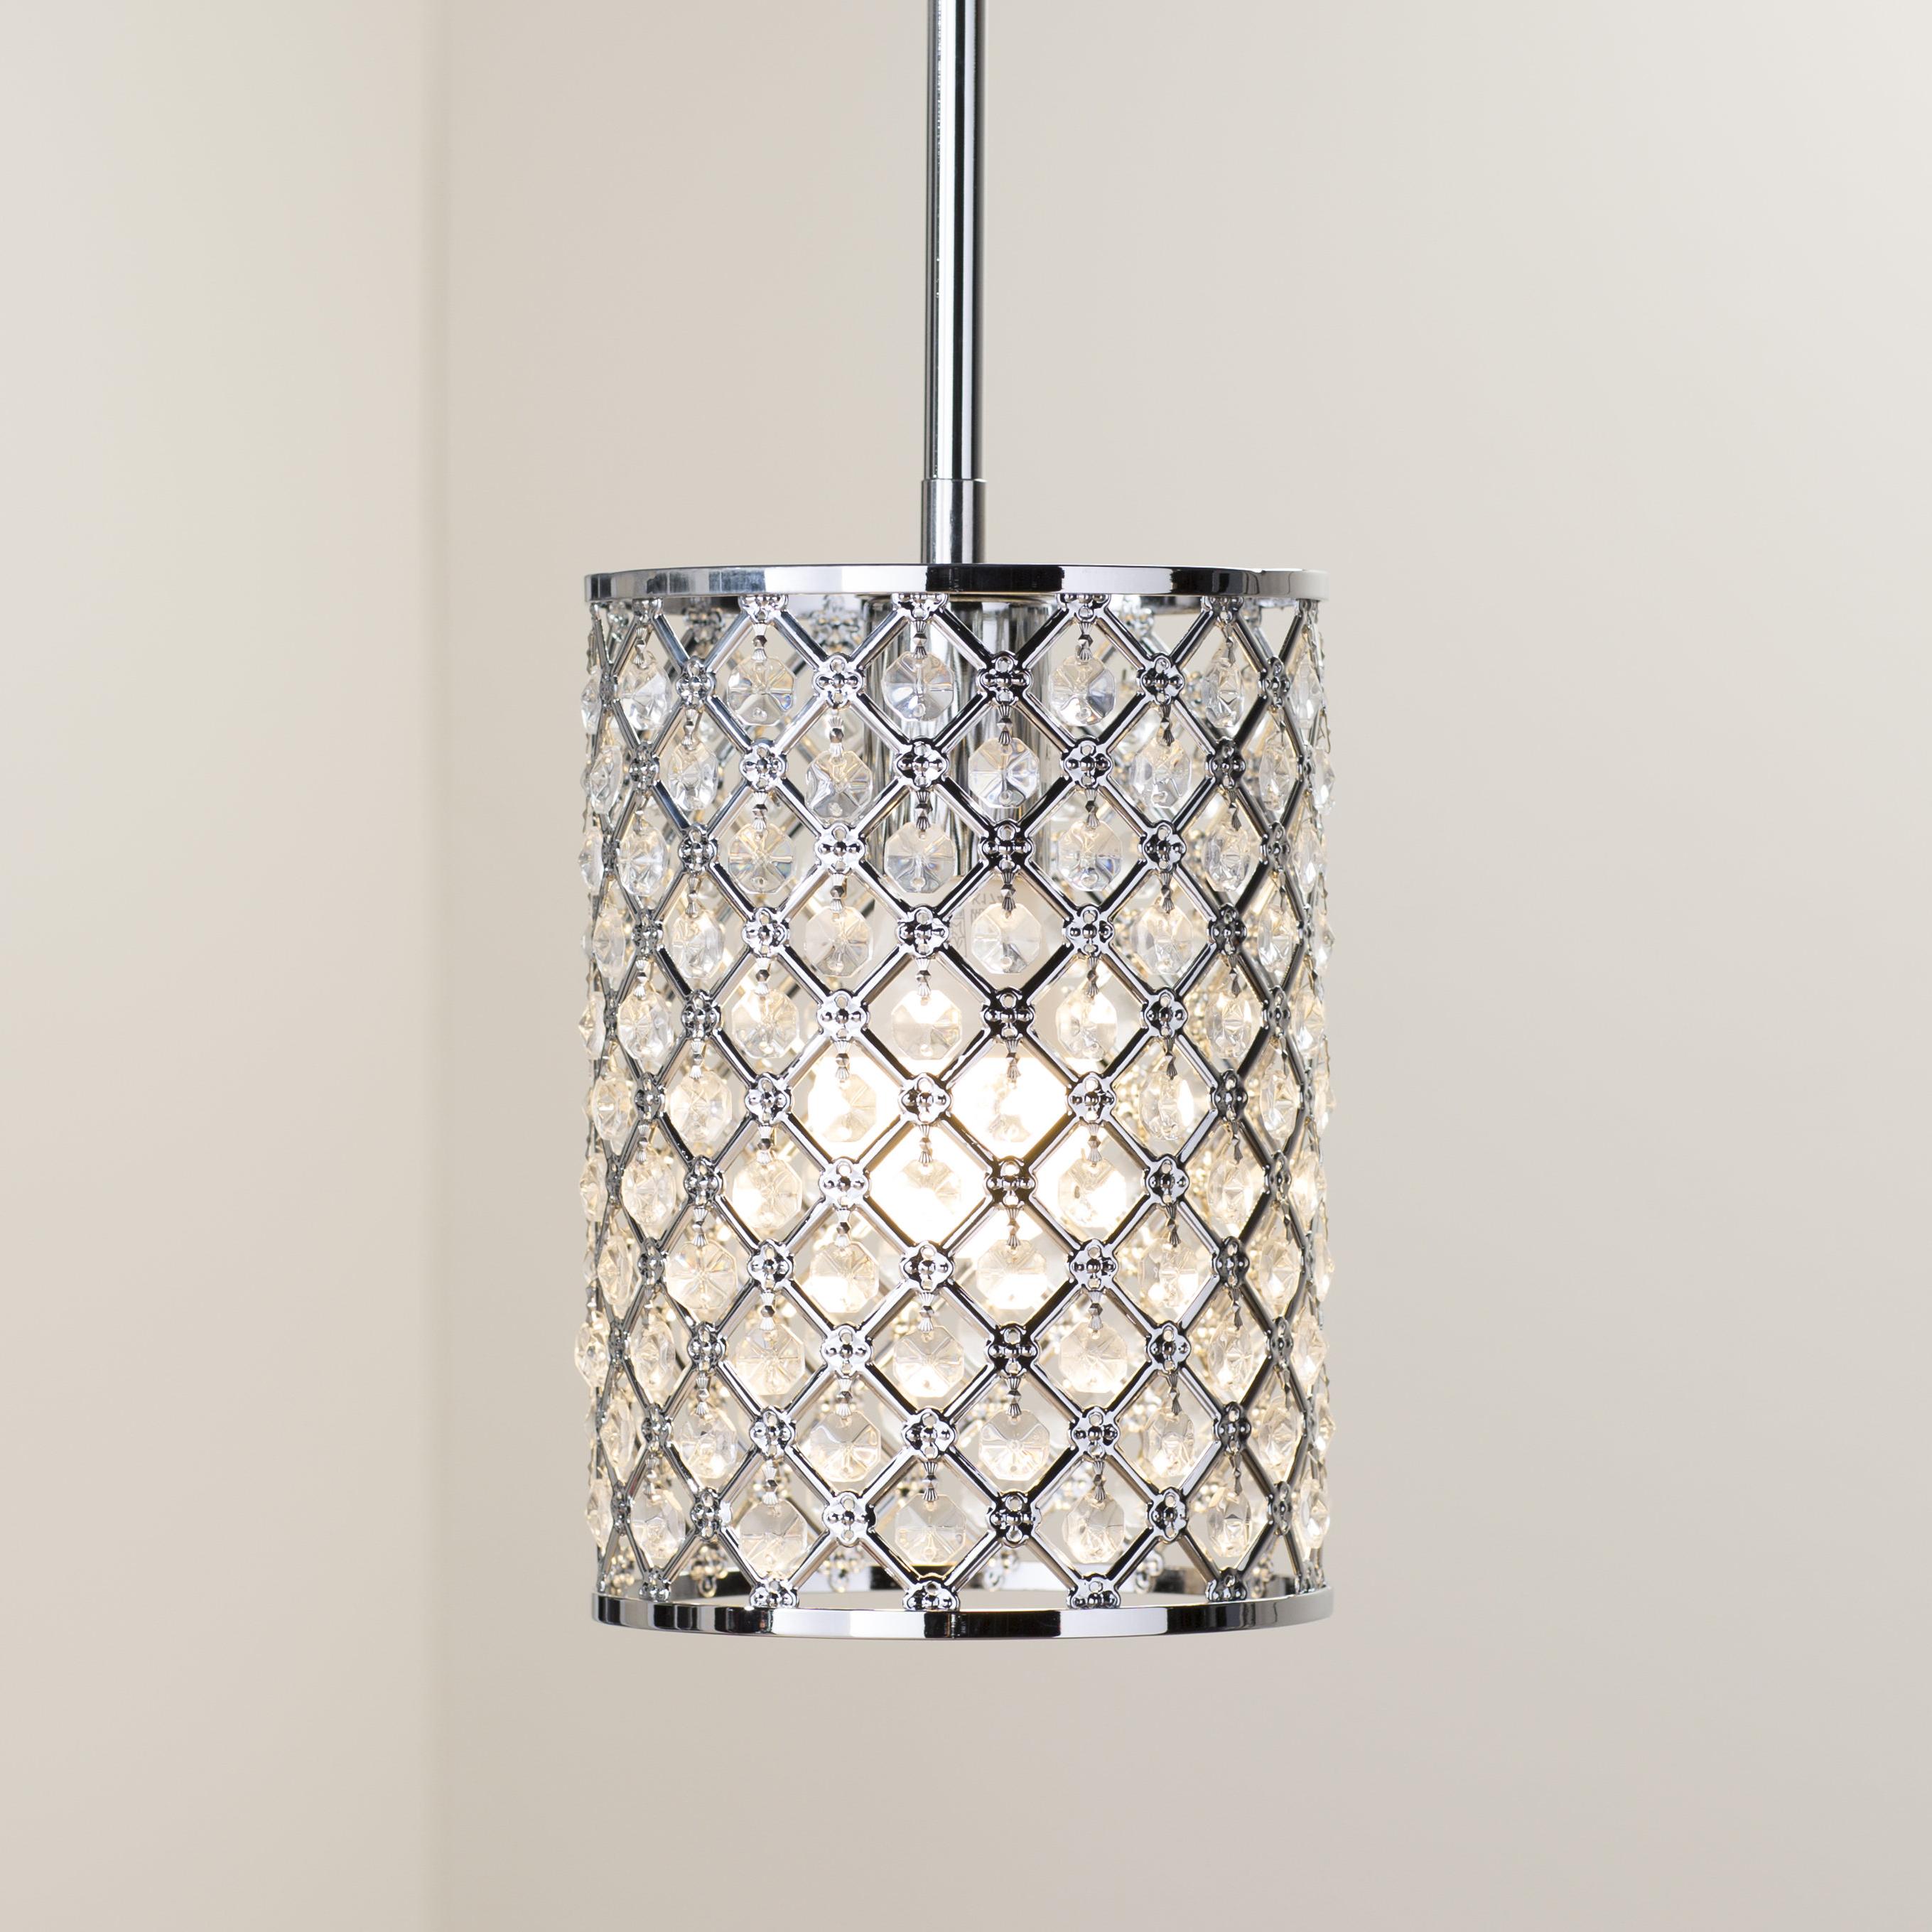 Araujo 1 Light Crystal Pendant Regarding Latest Hurst 1 Light Single Cylinder Pendants (Gallery 9 of 20)